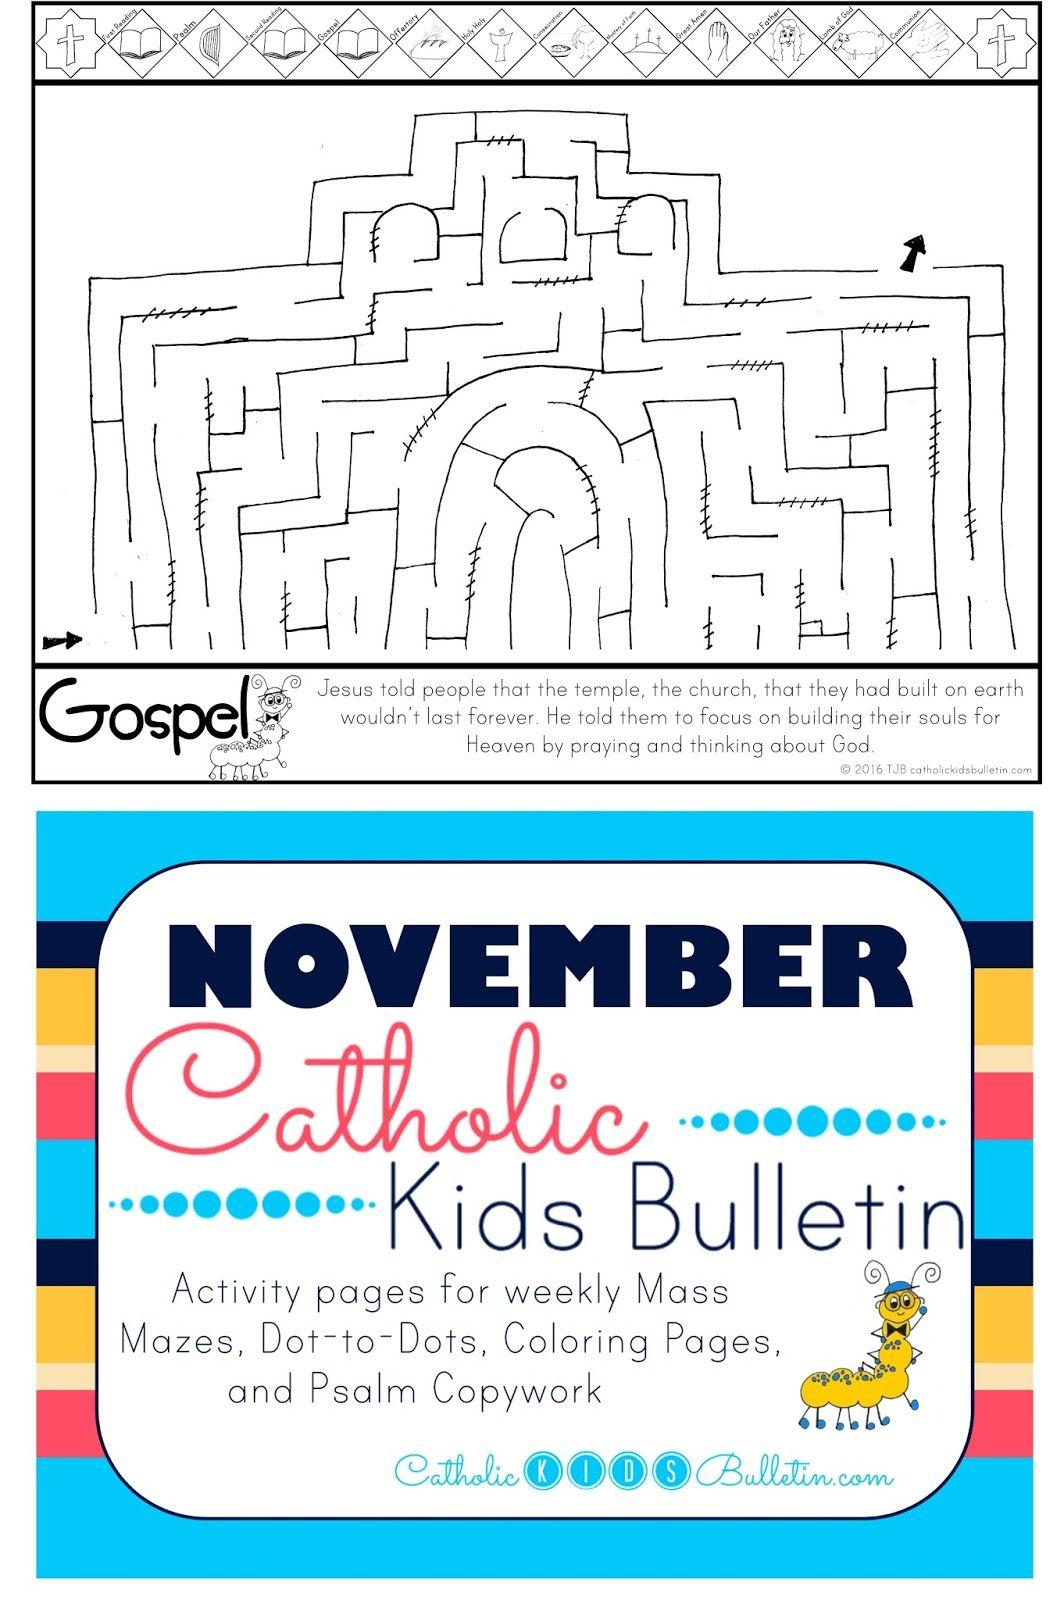 Catholic Kids Bulletin Weekly Mass Prep For Kids Luke 21 5 19